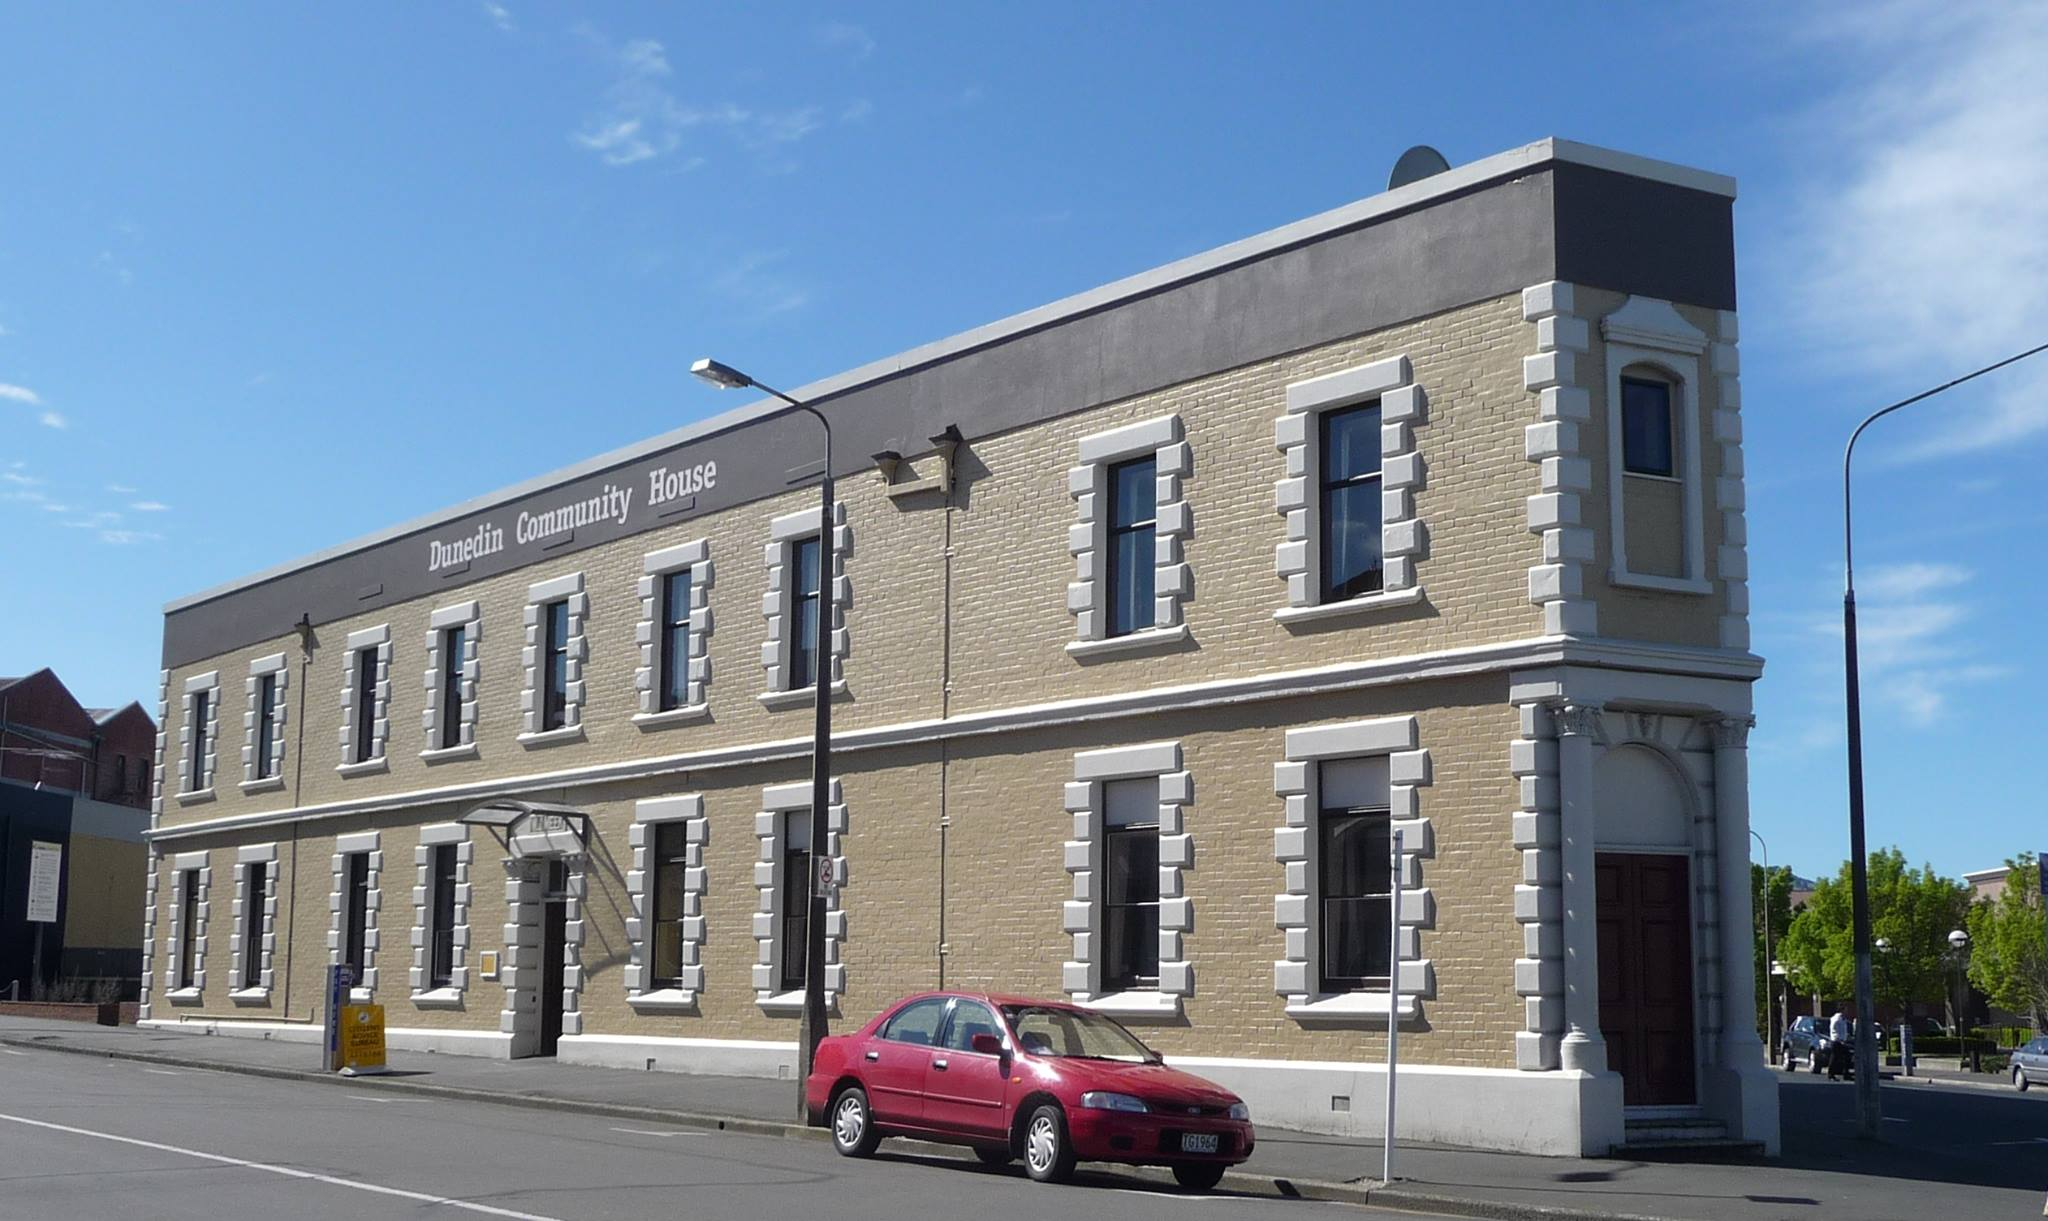 Dunedin Community House